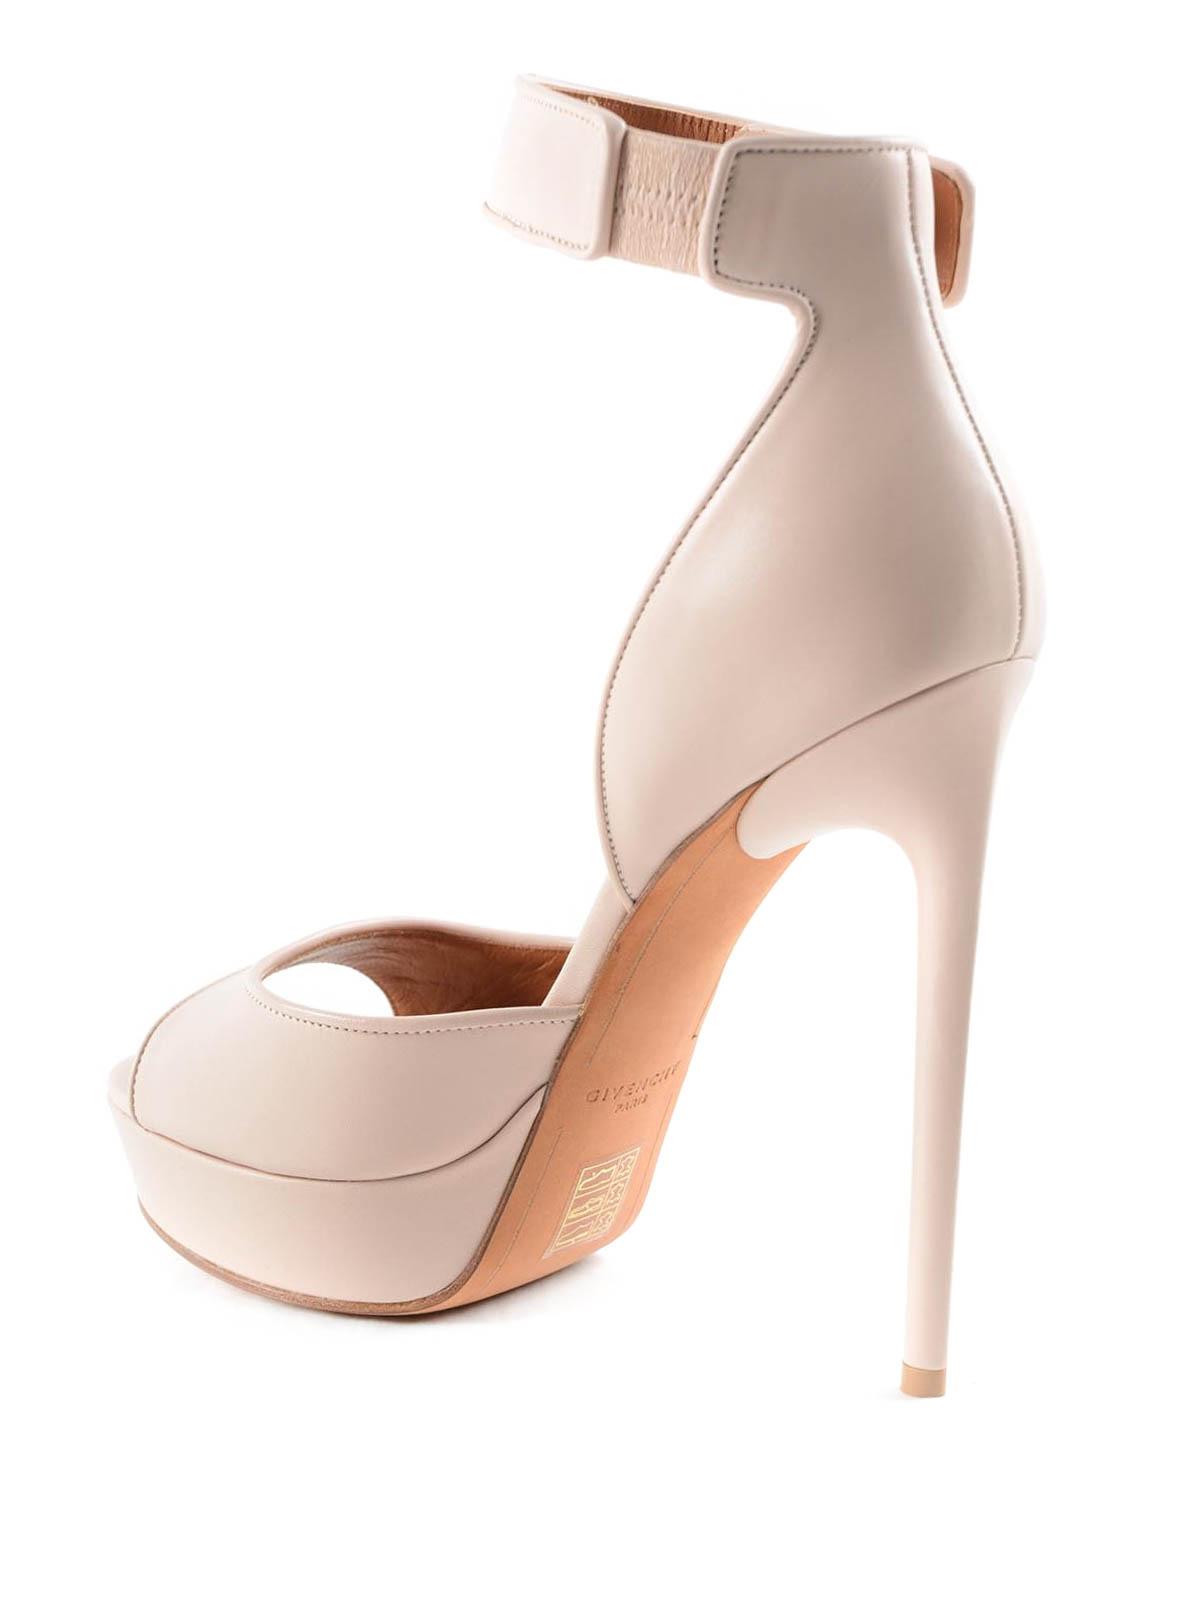 904a0b9666a4 Givenchy - Shark lock sandals - sandals - 8129004657